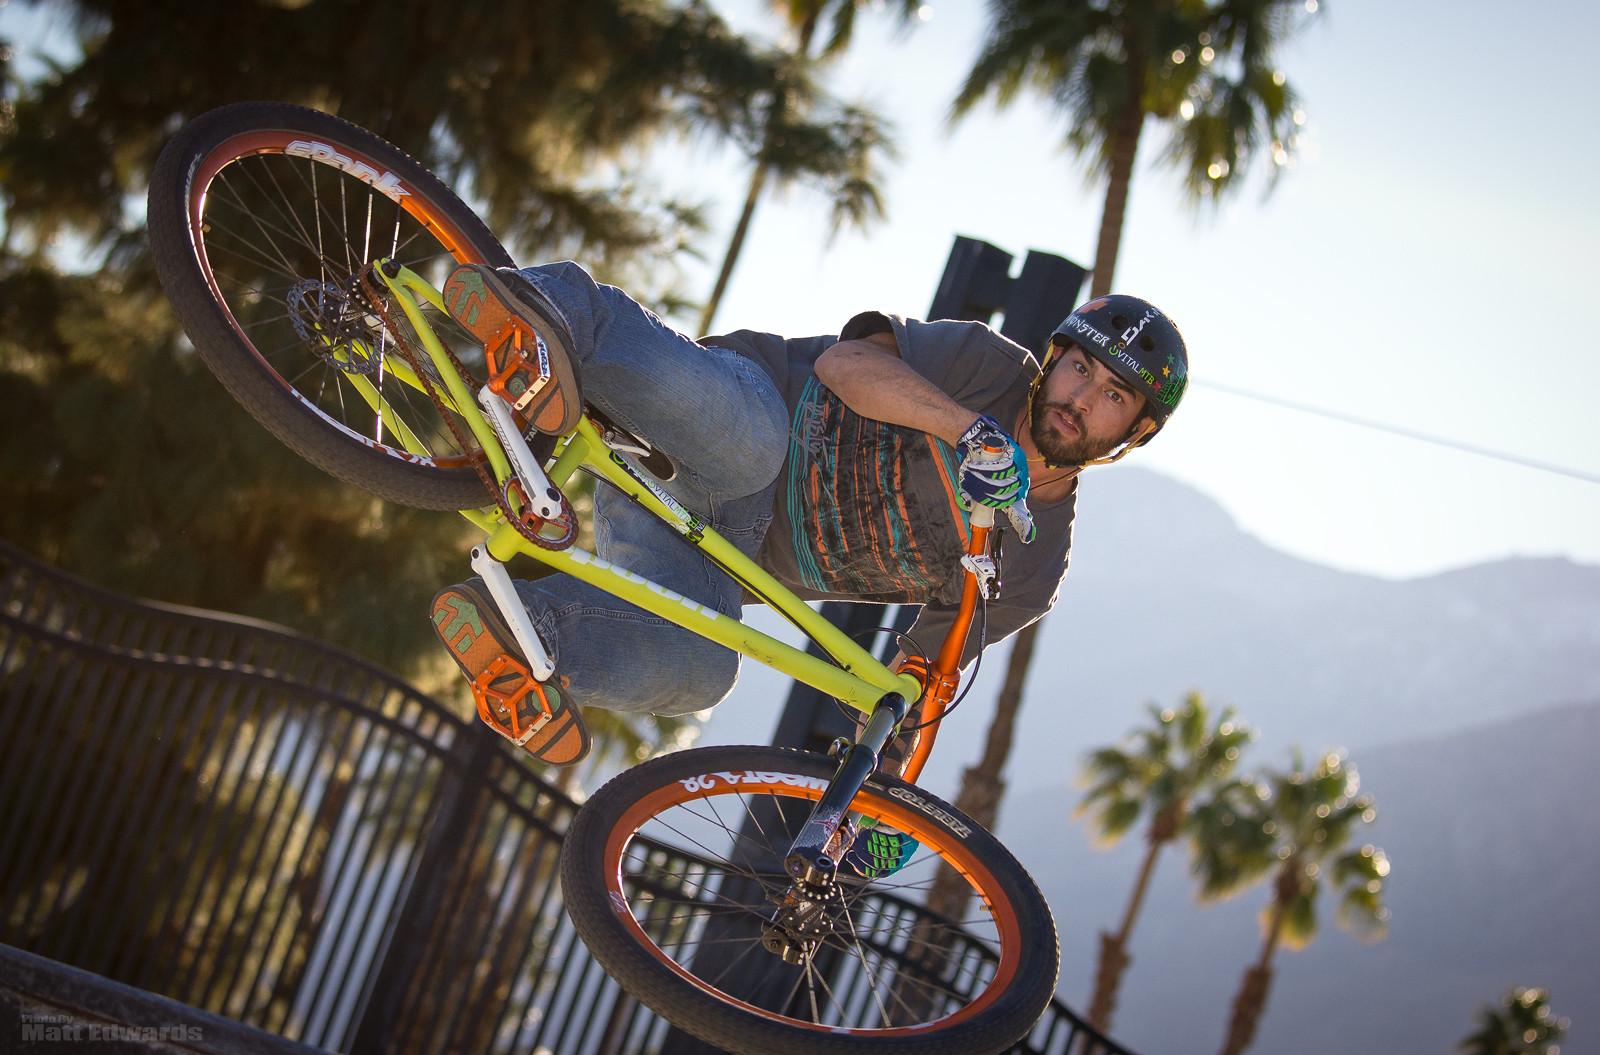 You lookin at me? - EdwardsEntertainment - Mountain Biking Pictures - Vital MTB